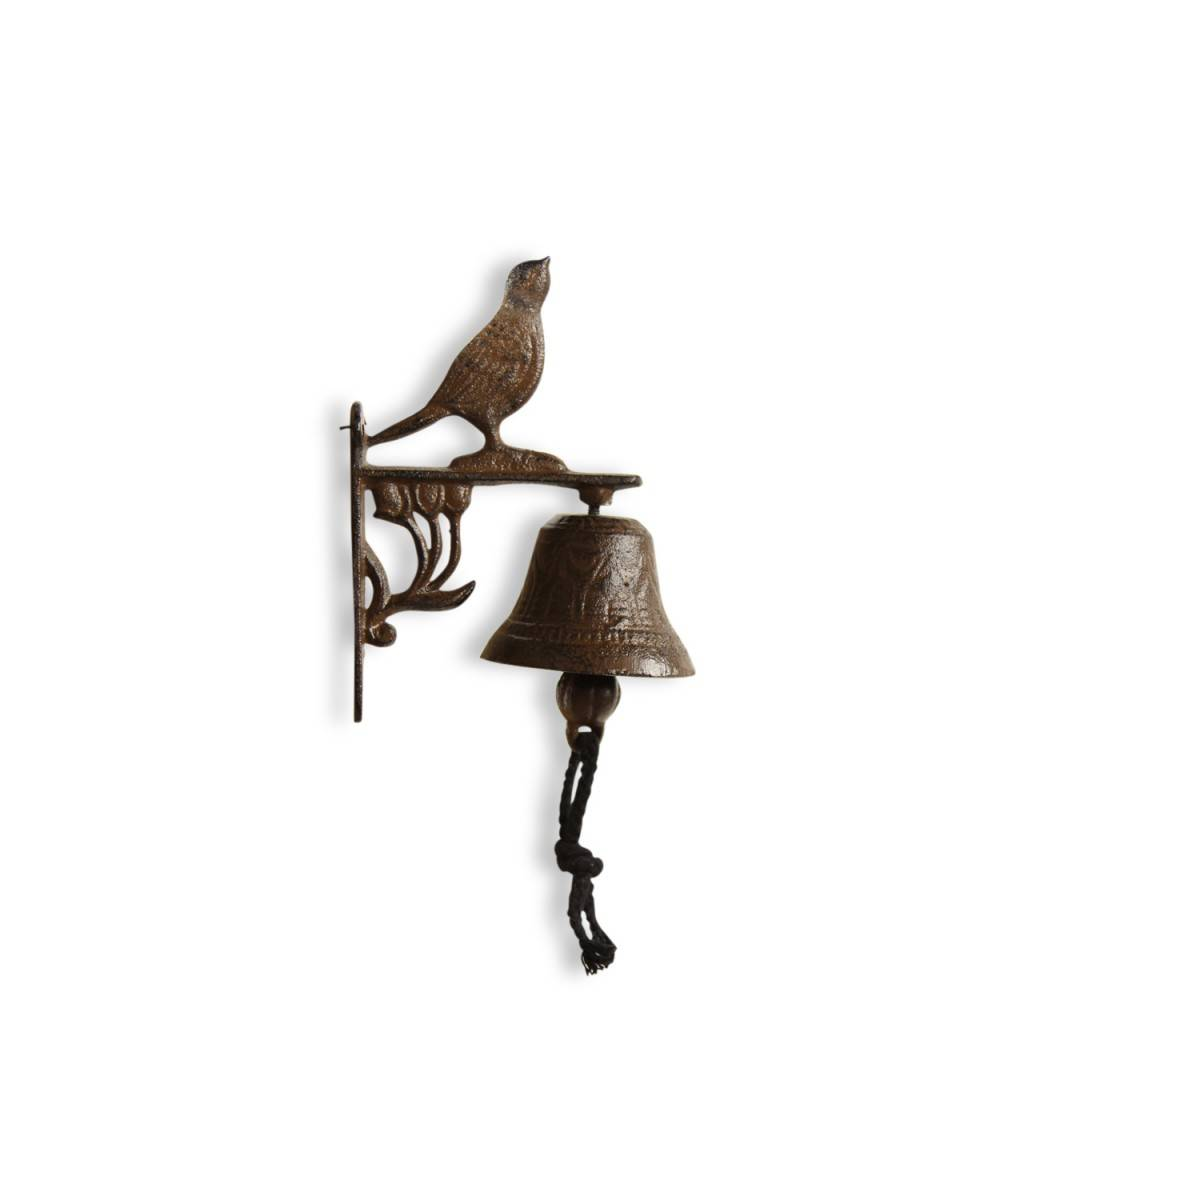 Cloche Oiseau Fonte Marron 12x7.5x17cm